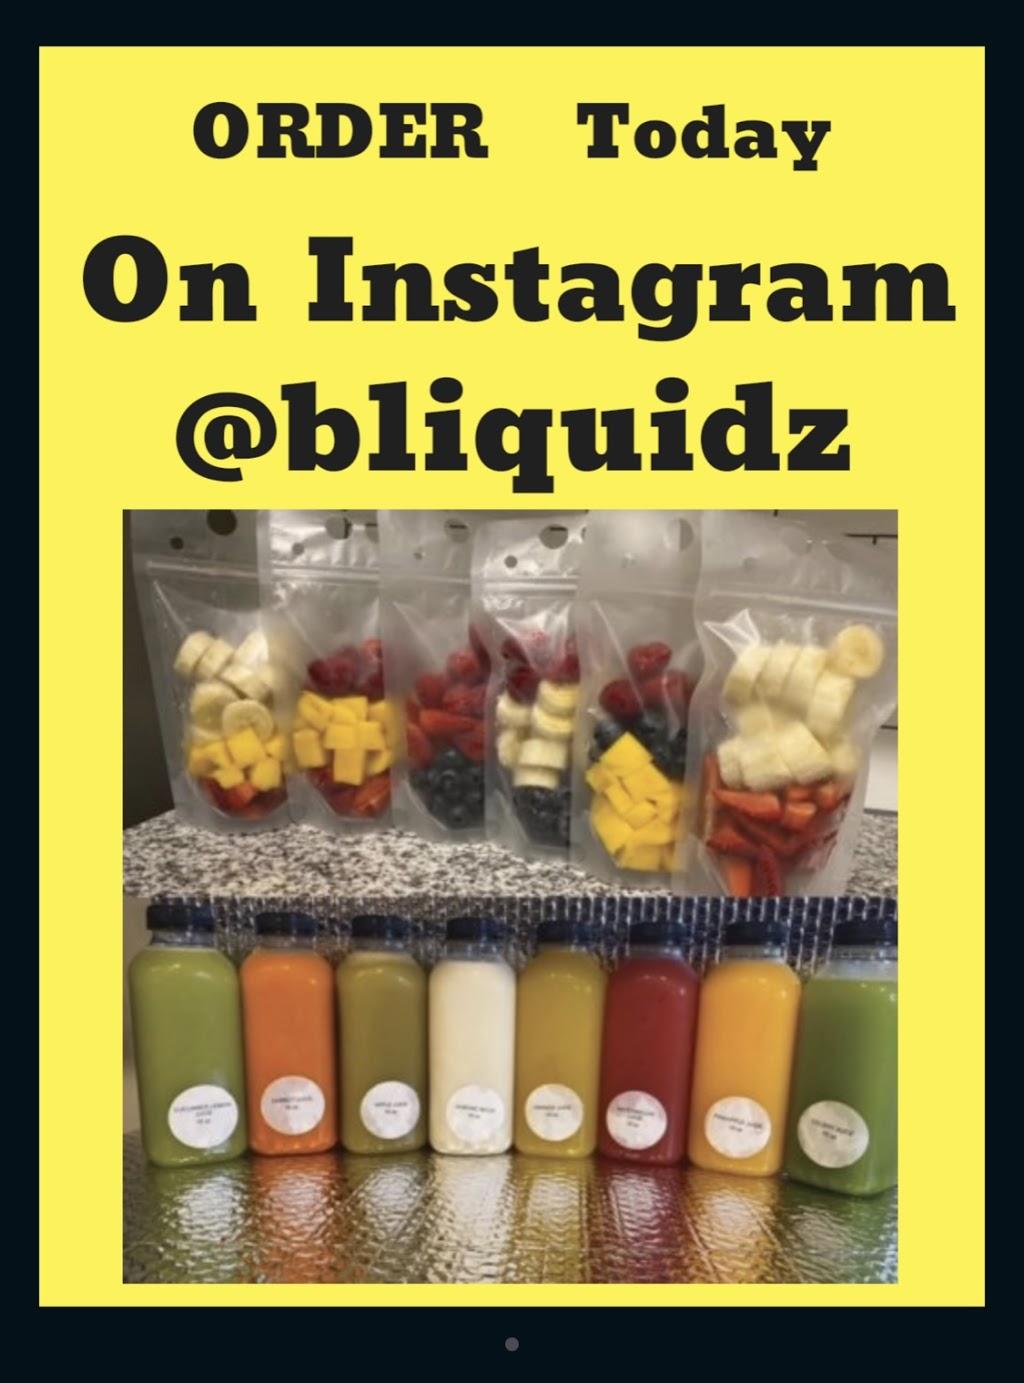 Bliquidz (Smoothies, Juices, Superfoods) | restaurant | 9550 Main St #190, Woodstock, GA 30188, USA | 6789032163 OR +1 678-903-2163